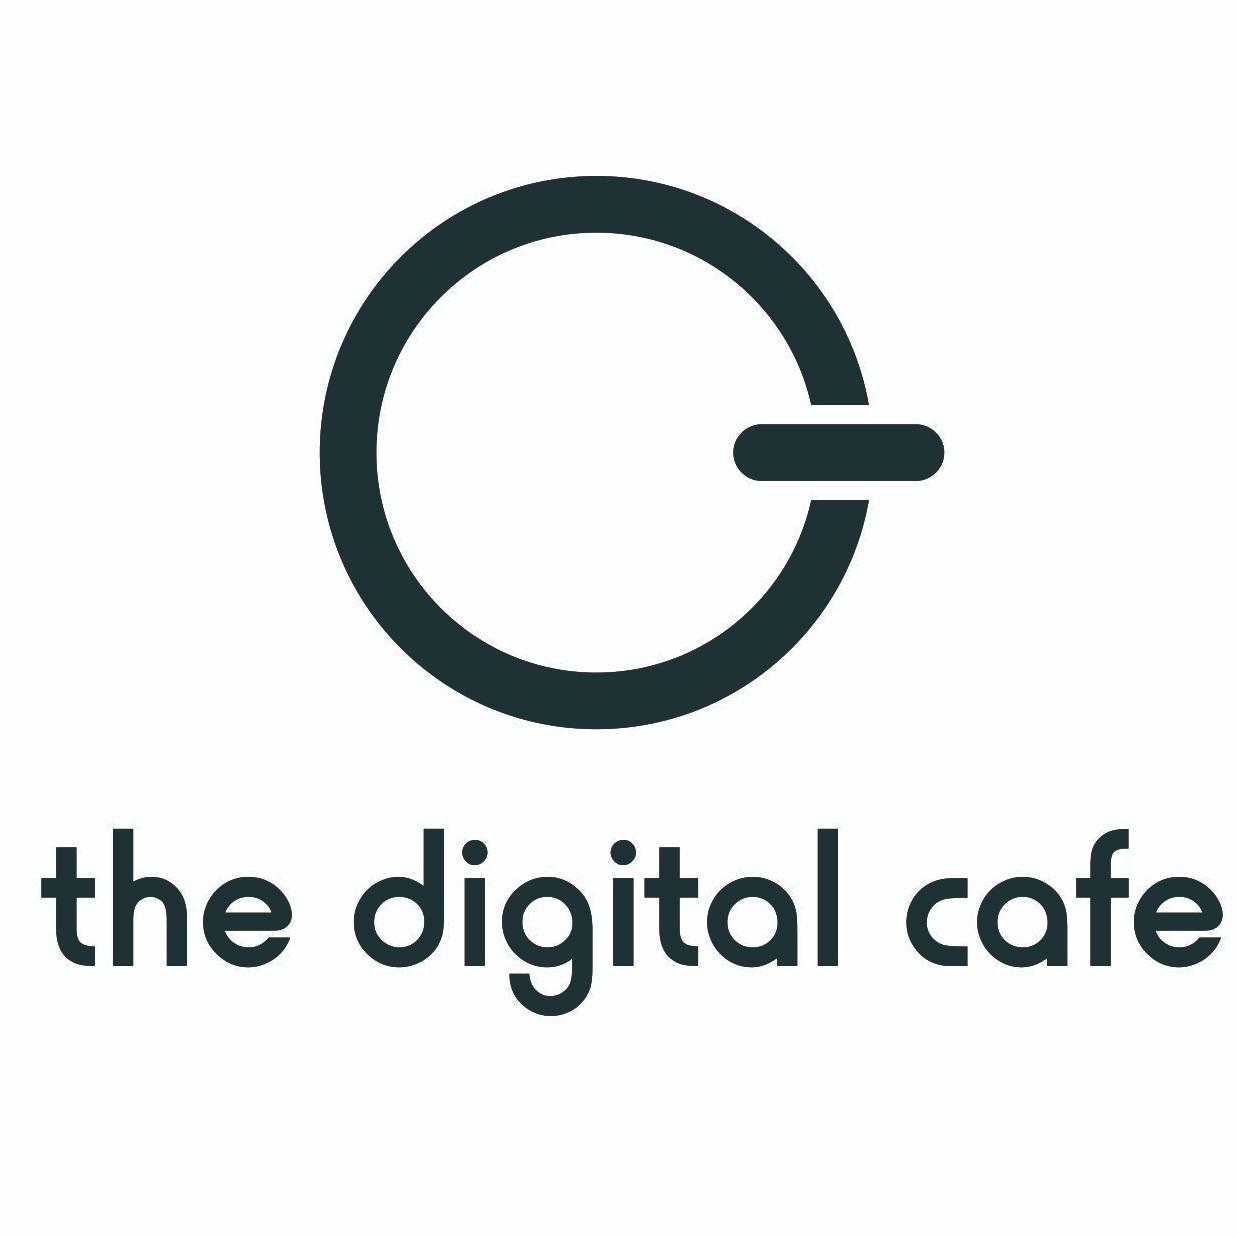 The Digital Cafe logo